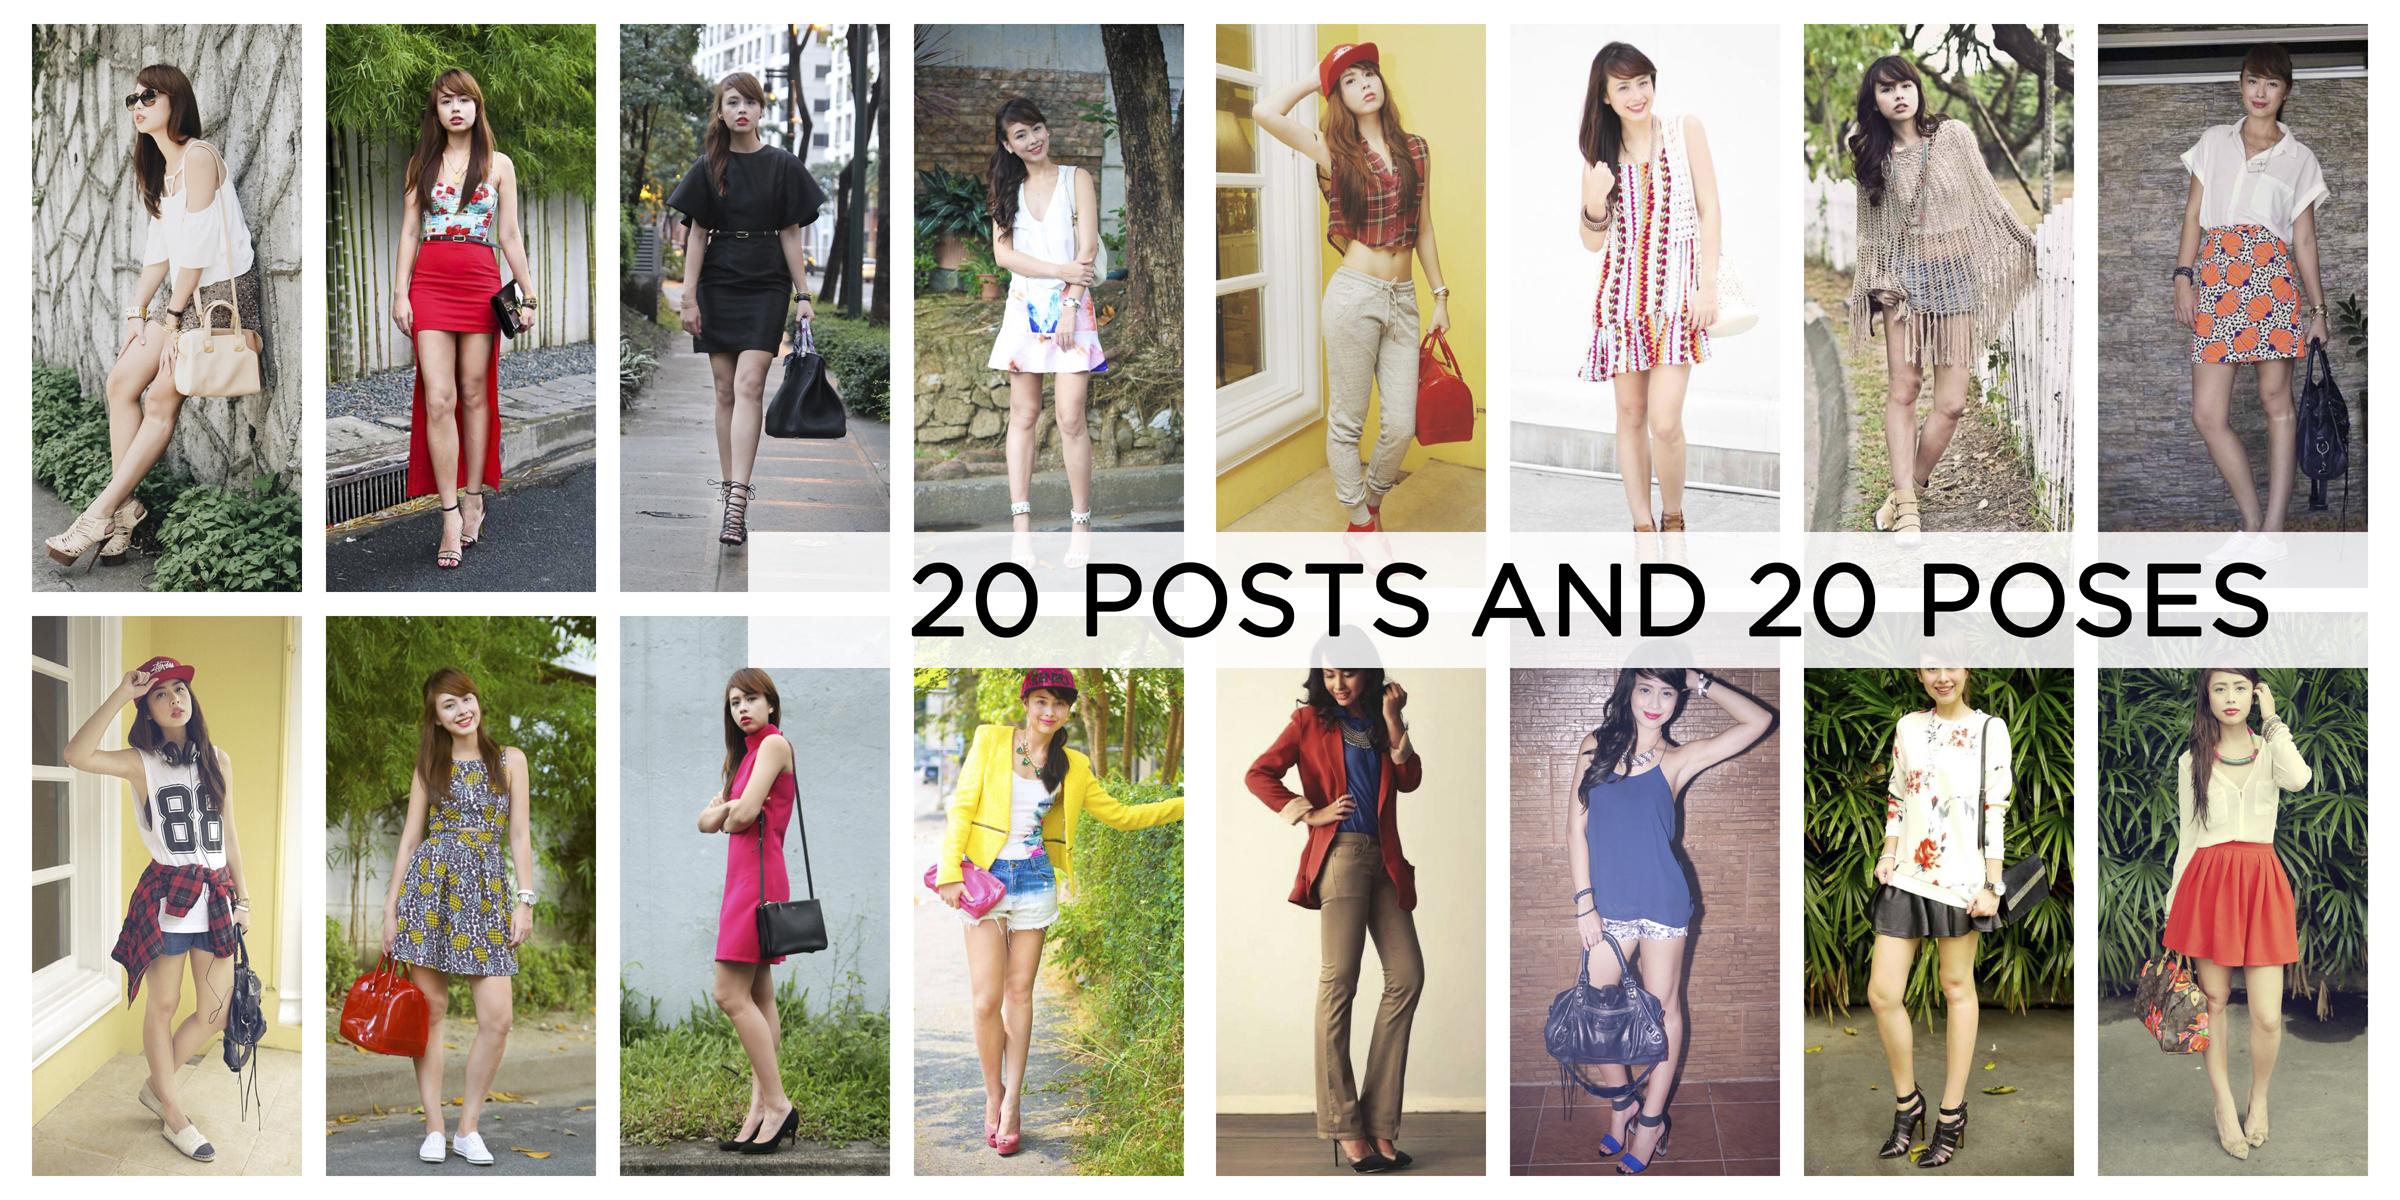 20poses